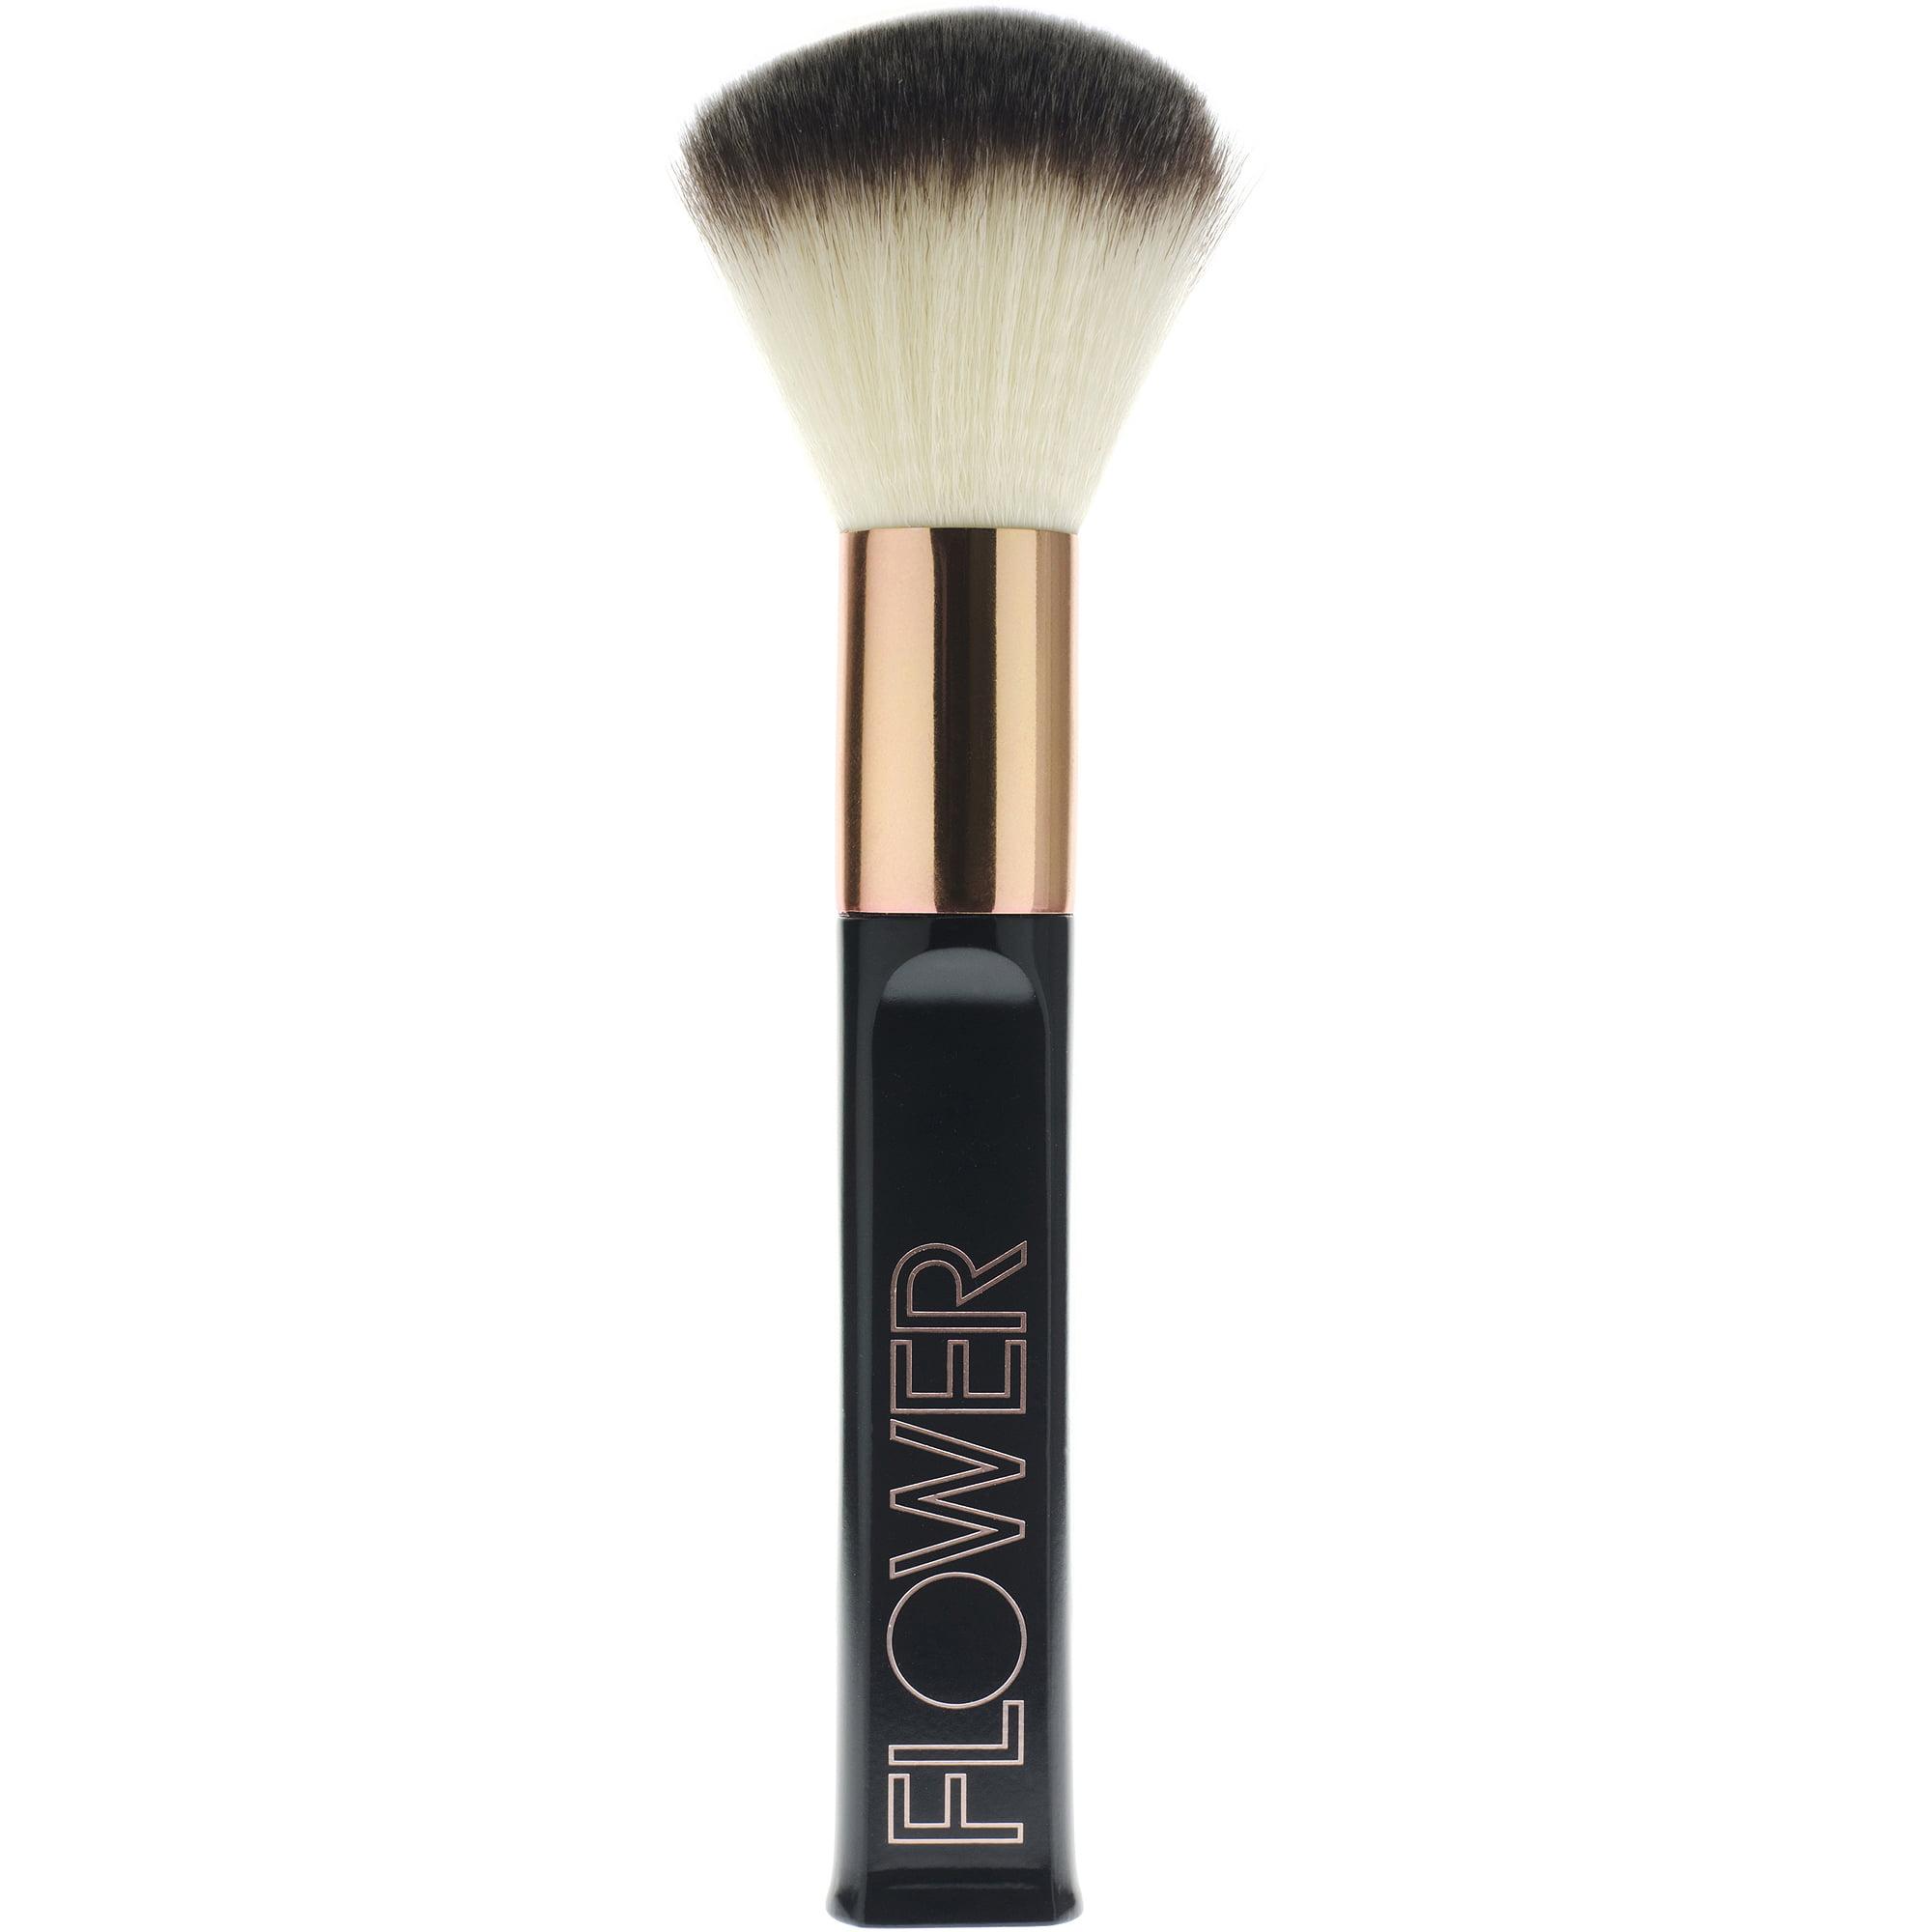 MAESA FLOWER Ultimate Powder Makeup Brush